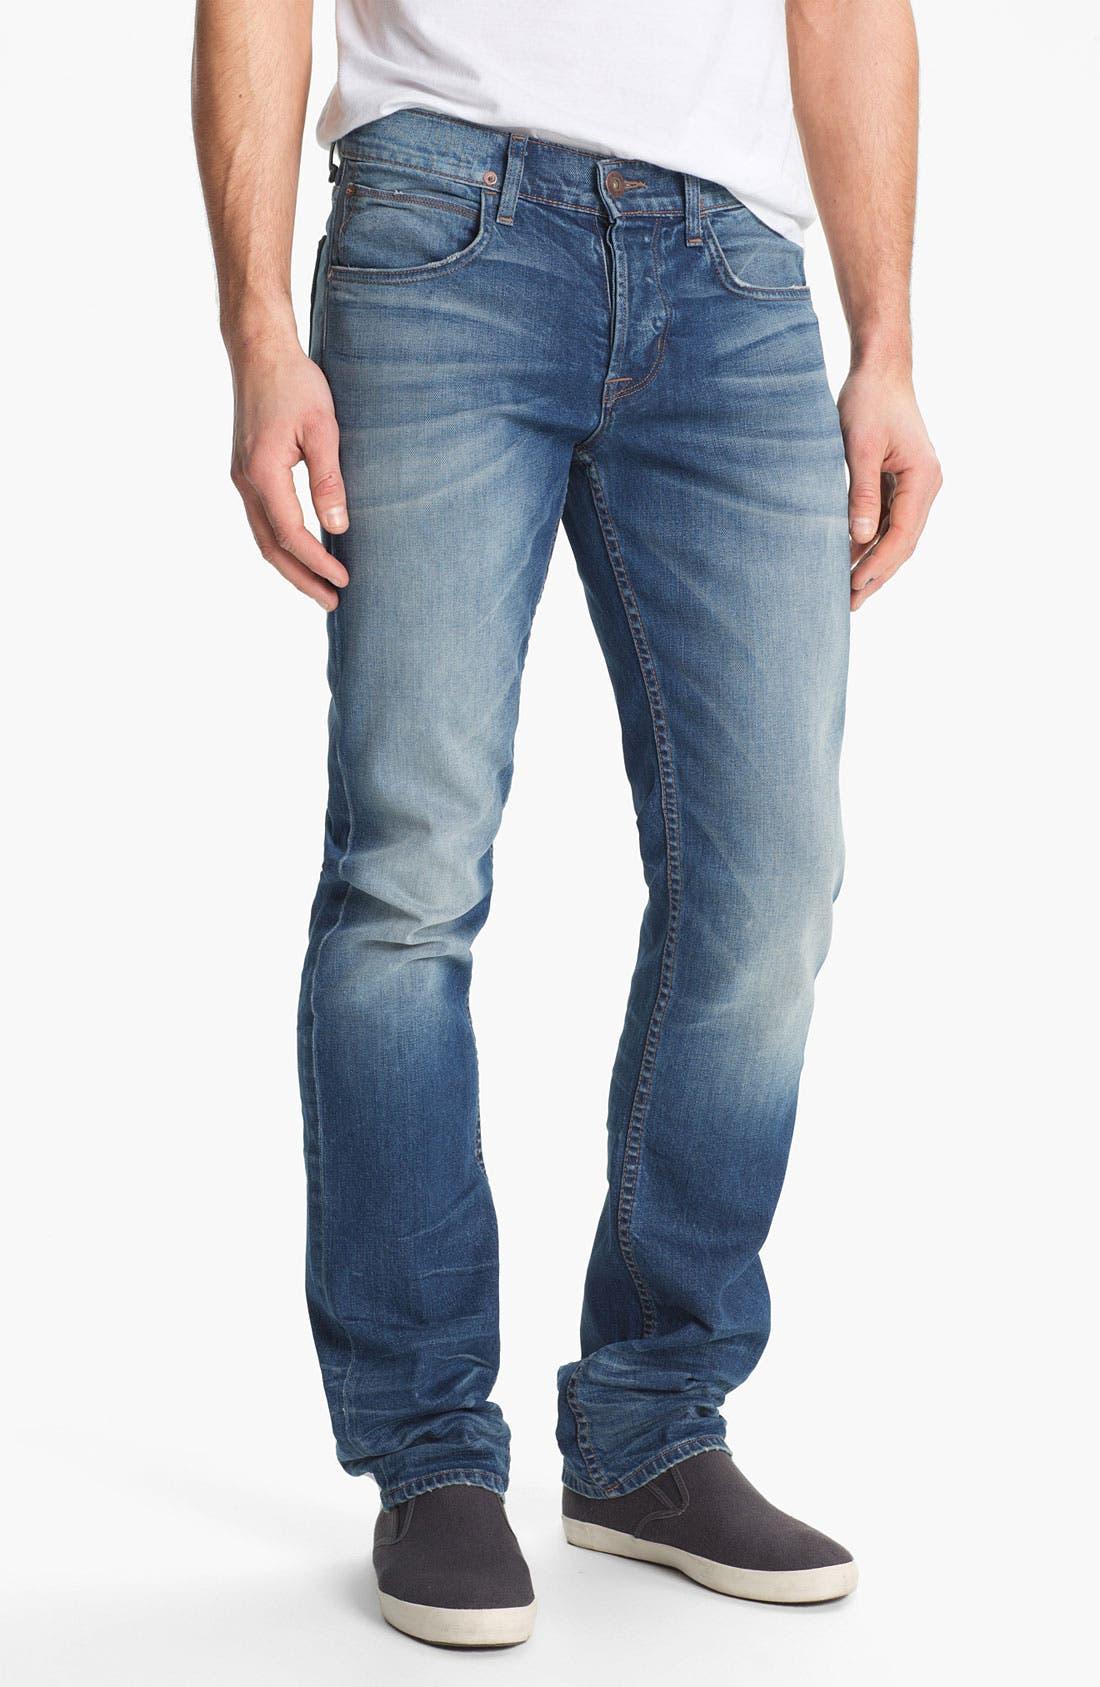 Alternate Image 1 Selected - Hudson Jeans 'Byron' Straight Leg Jeans (Seether)